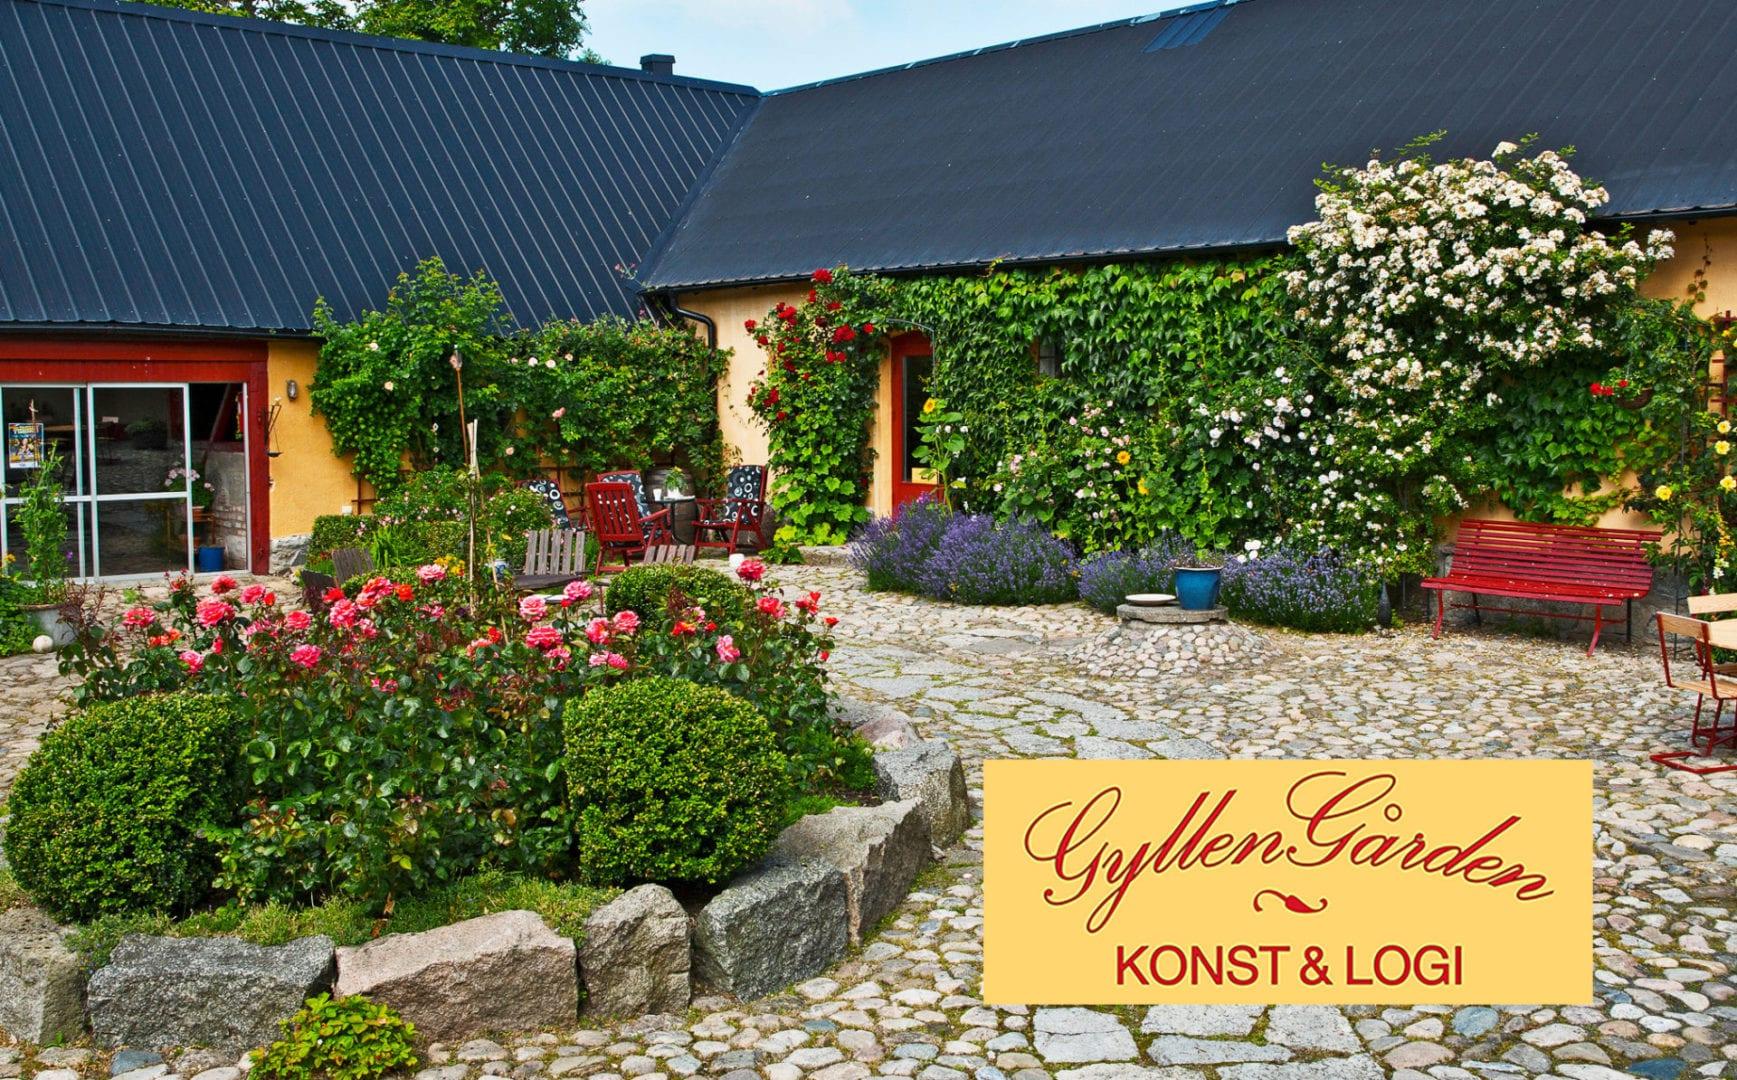 Gyllengården with log